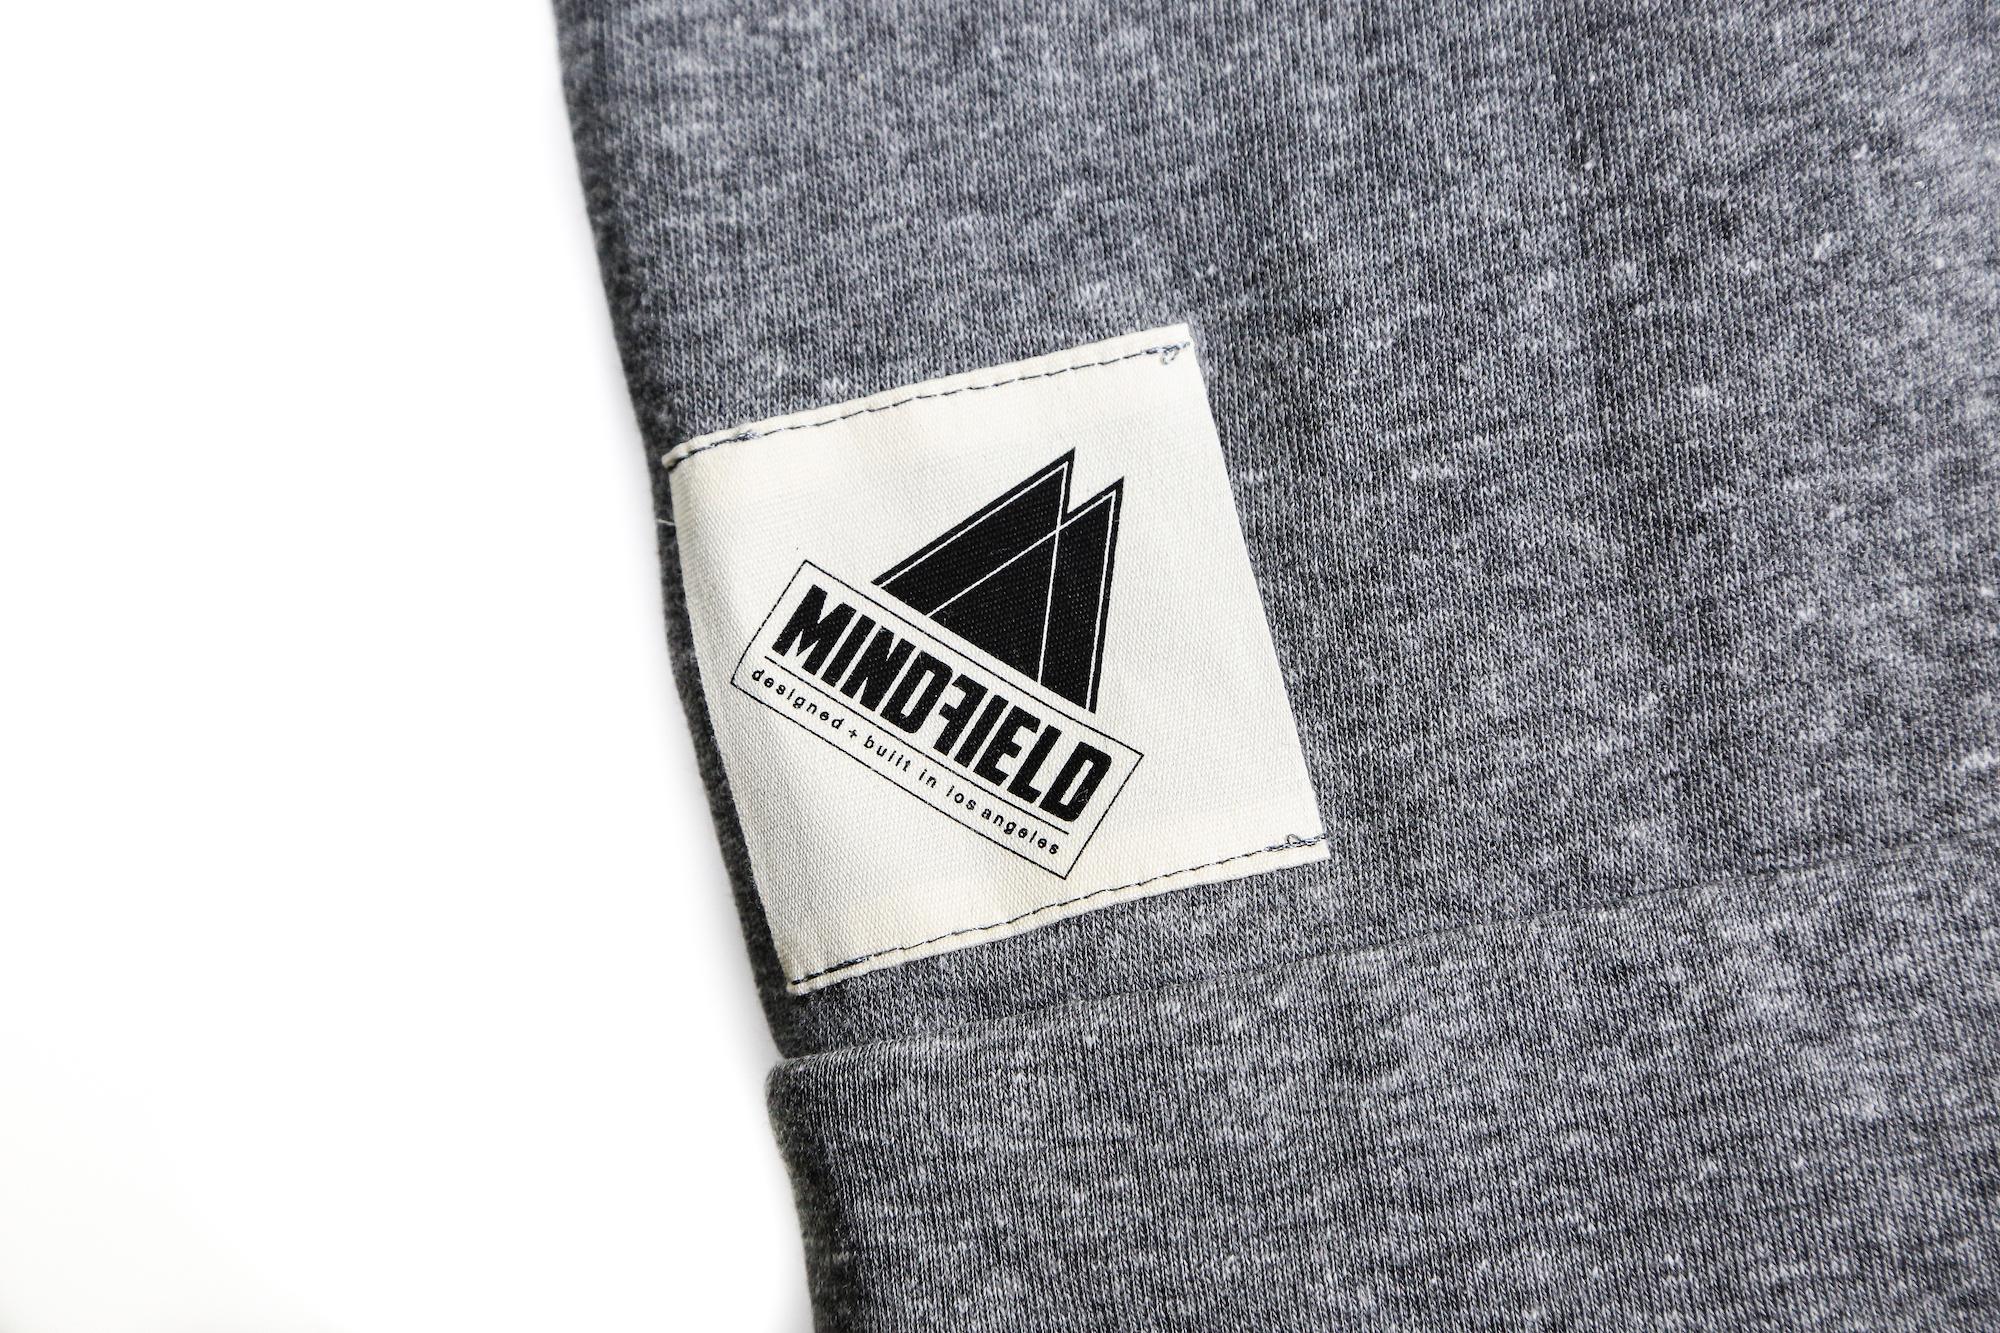 Mindfield woven tag sewn onto shirt